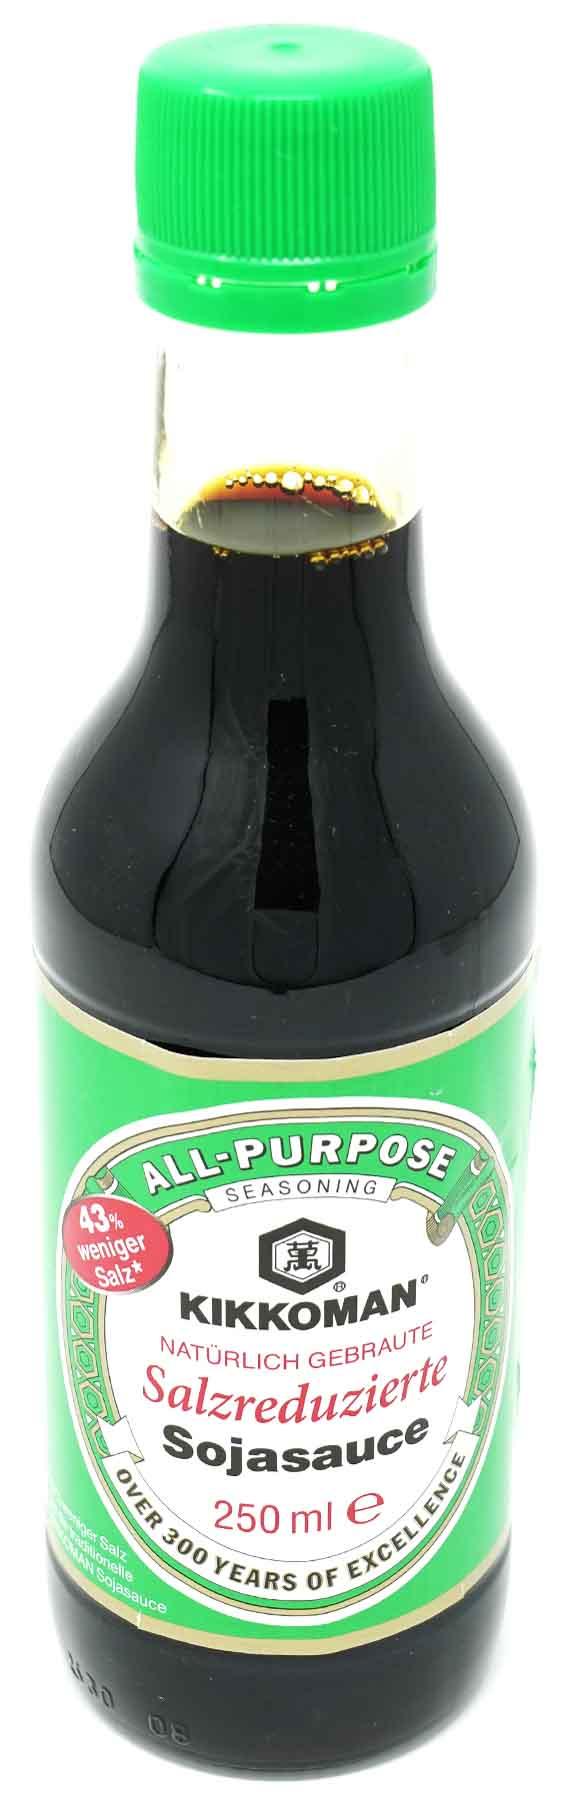 KIKKOMAN Soja Sauce salzreduziert, 250 ml